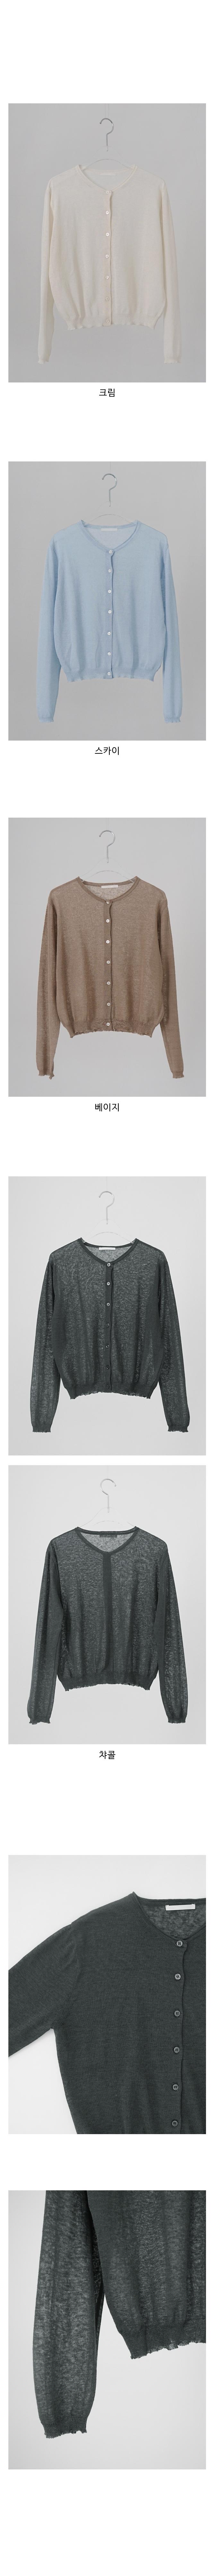 high linen basic cardigan (4colors)